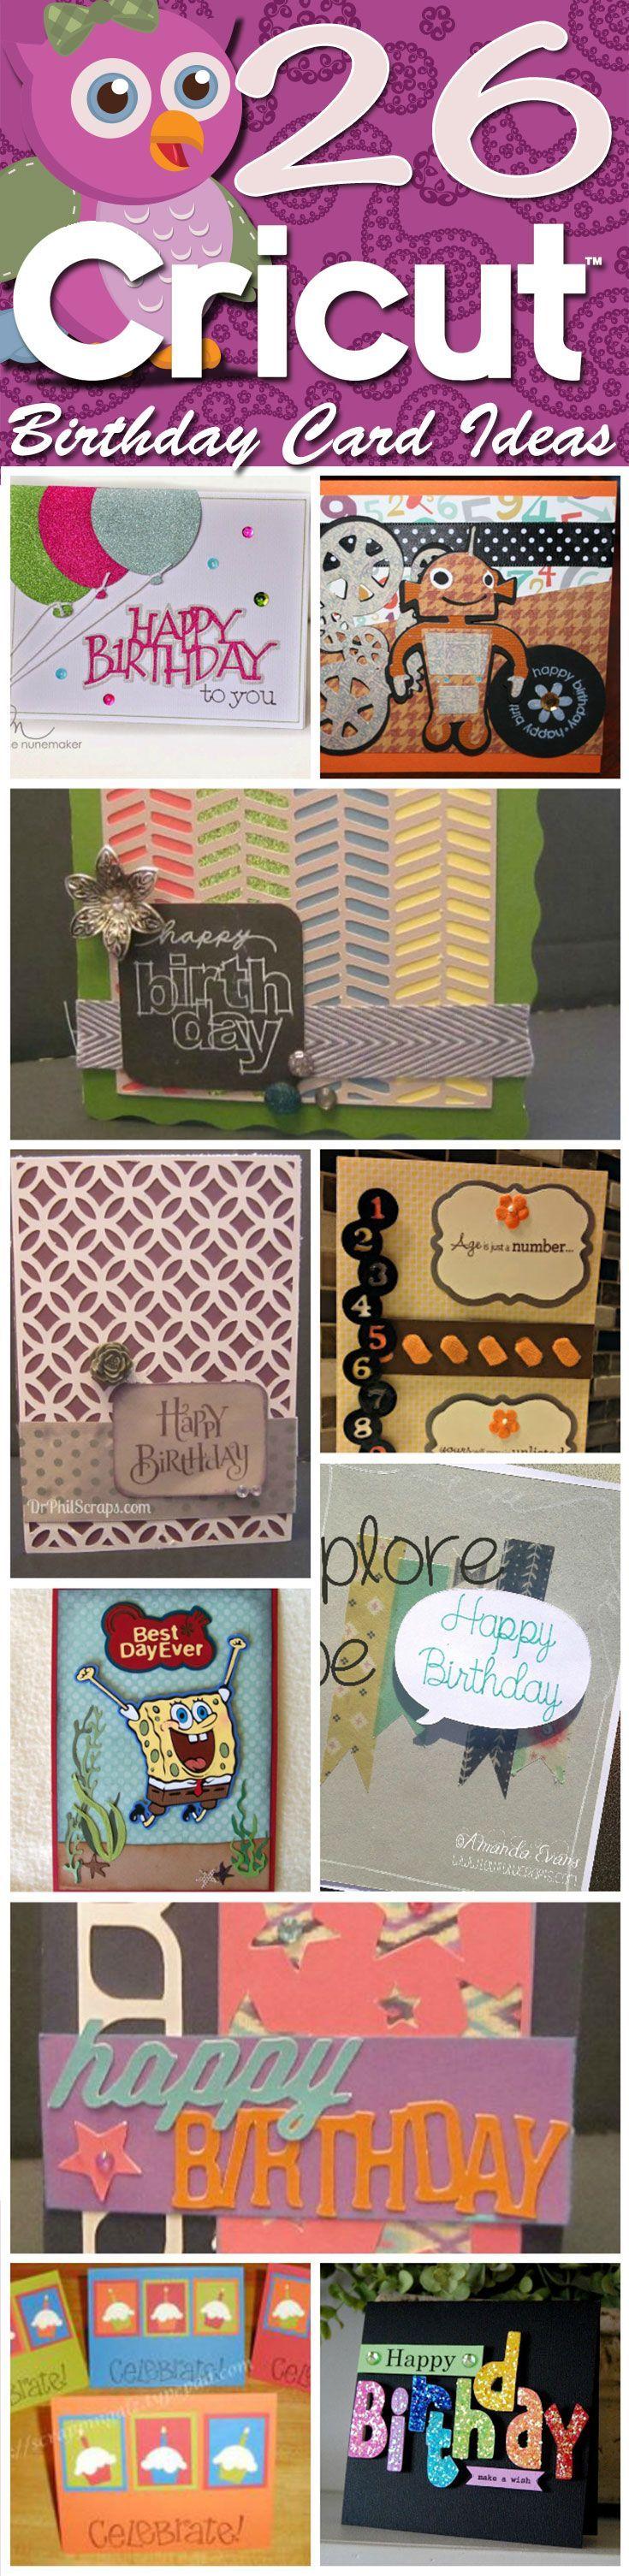 619 Best Children S Birthday Cards Images On Pinterest Football